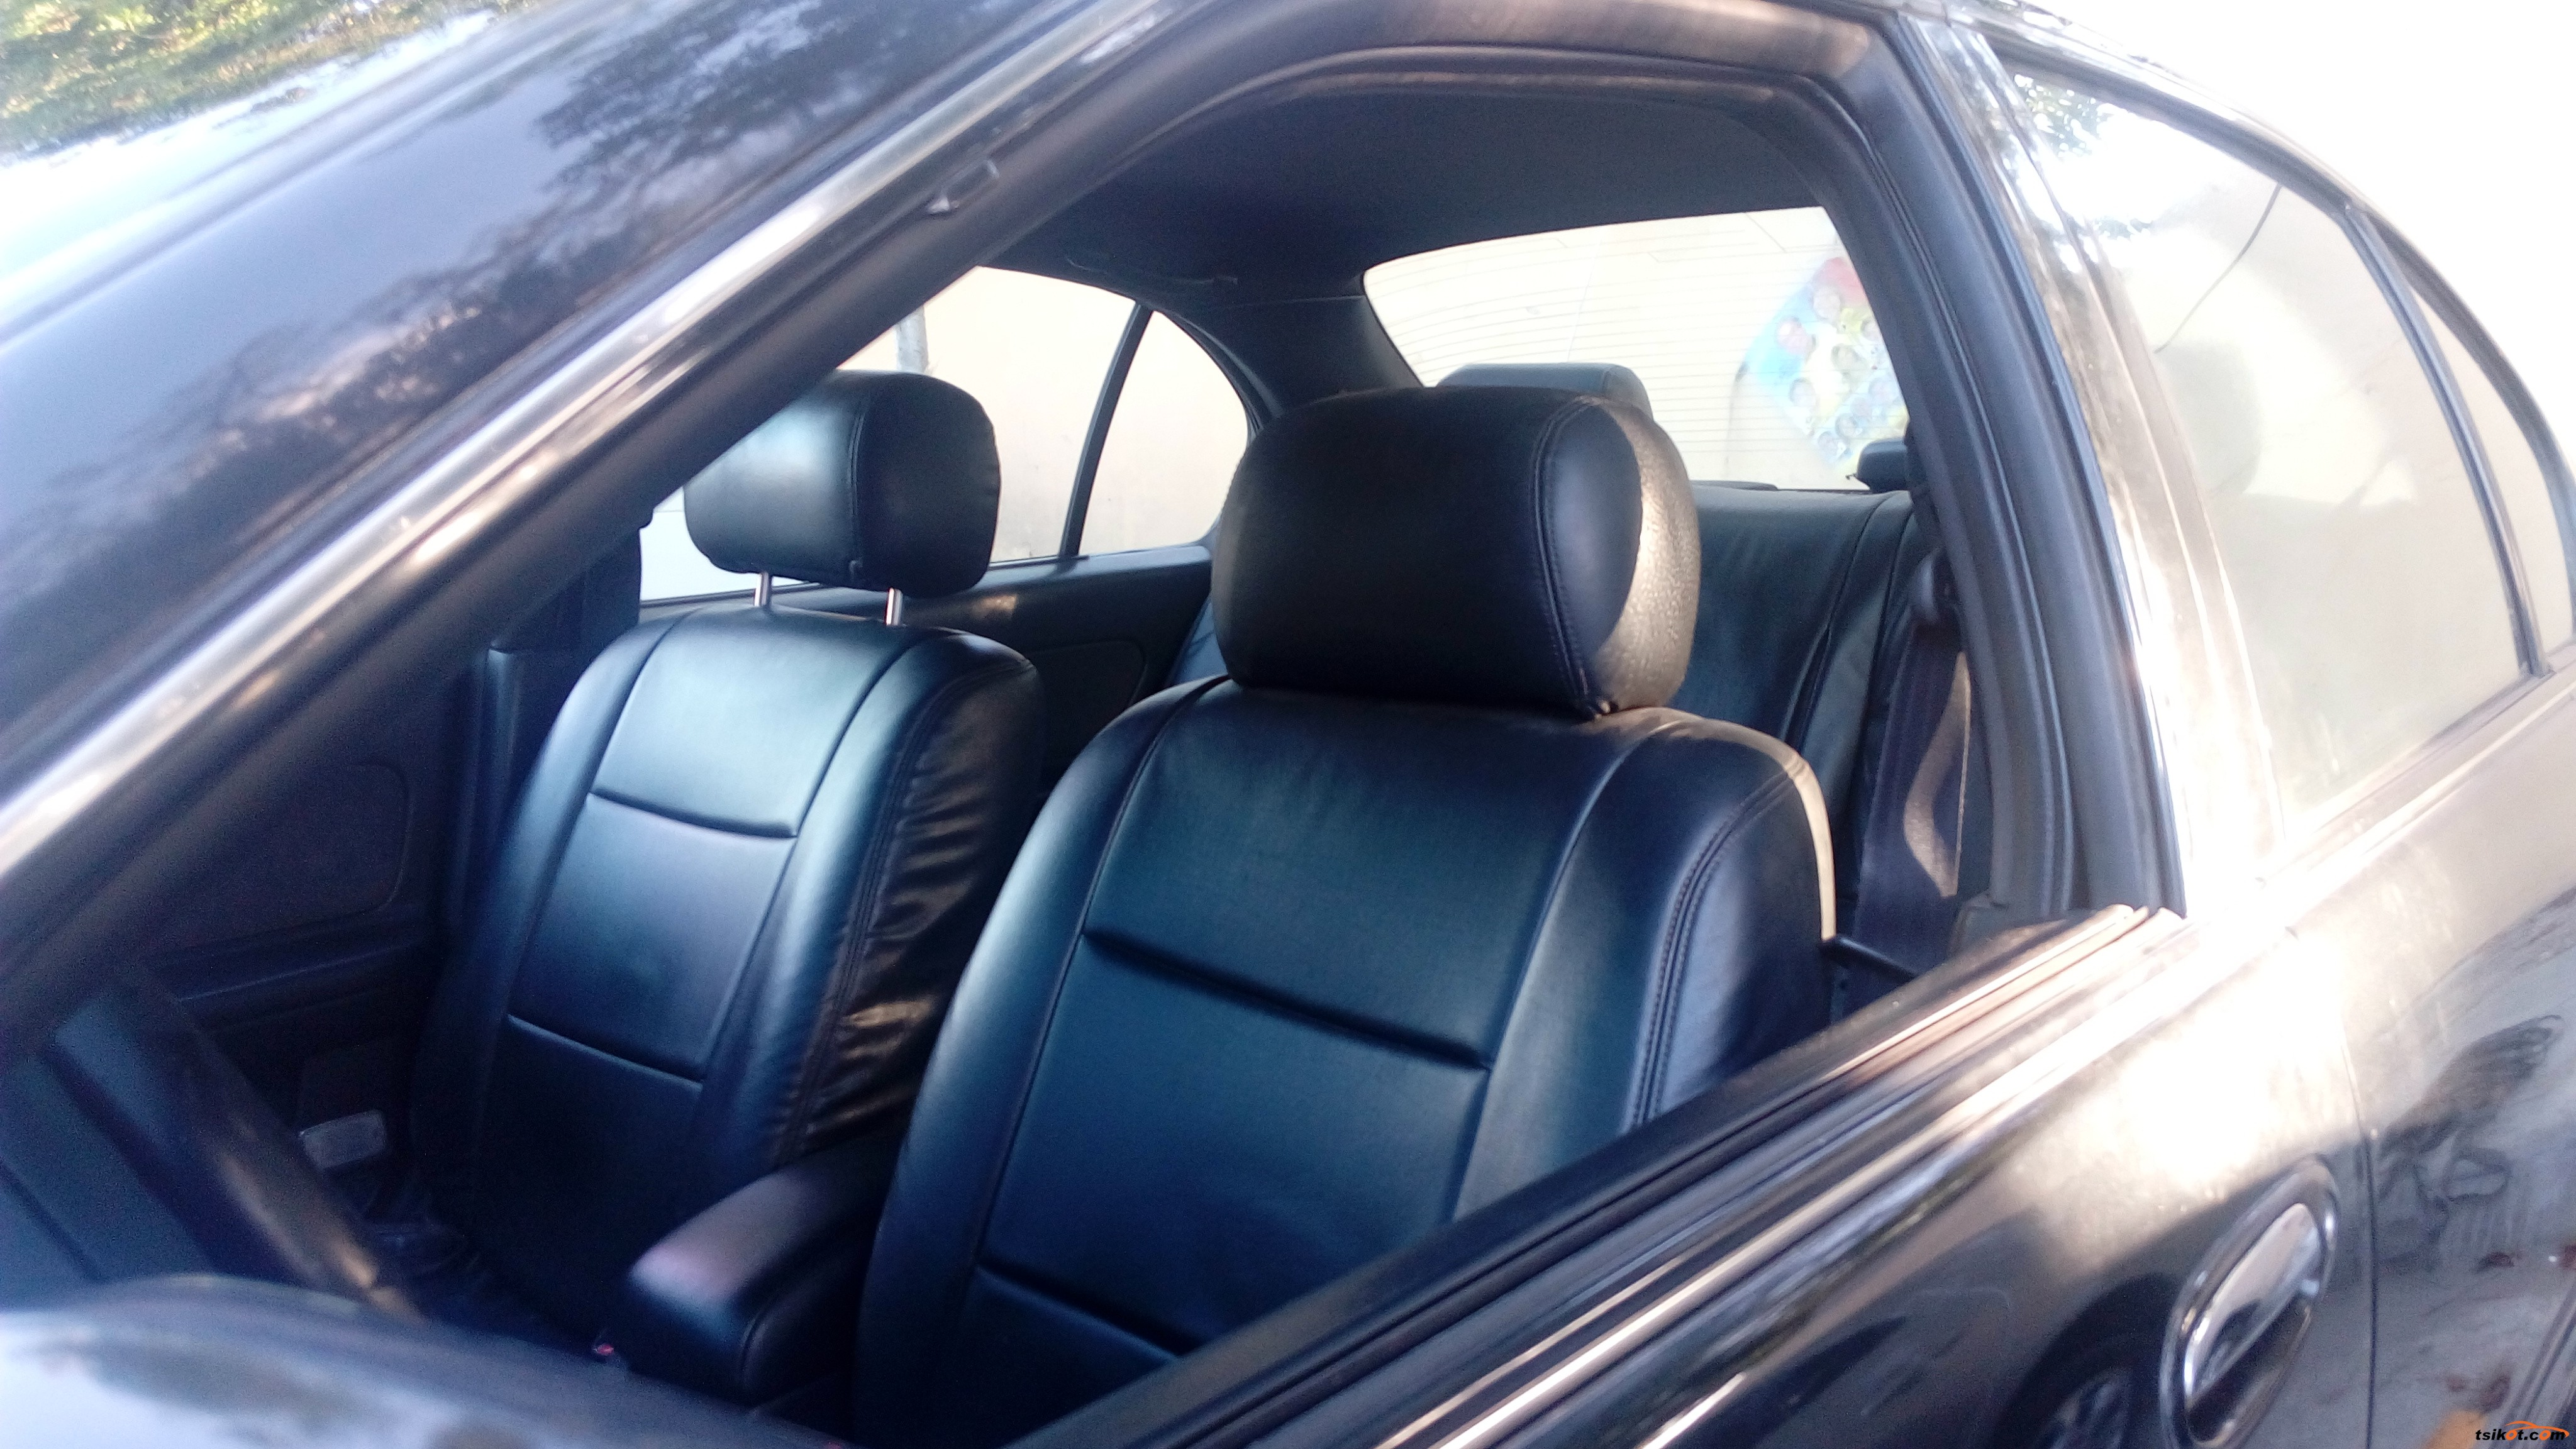 Nissan Cefiro 1997 - 5